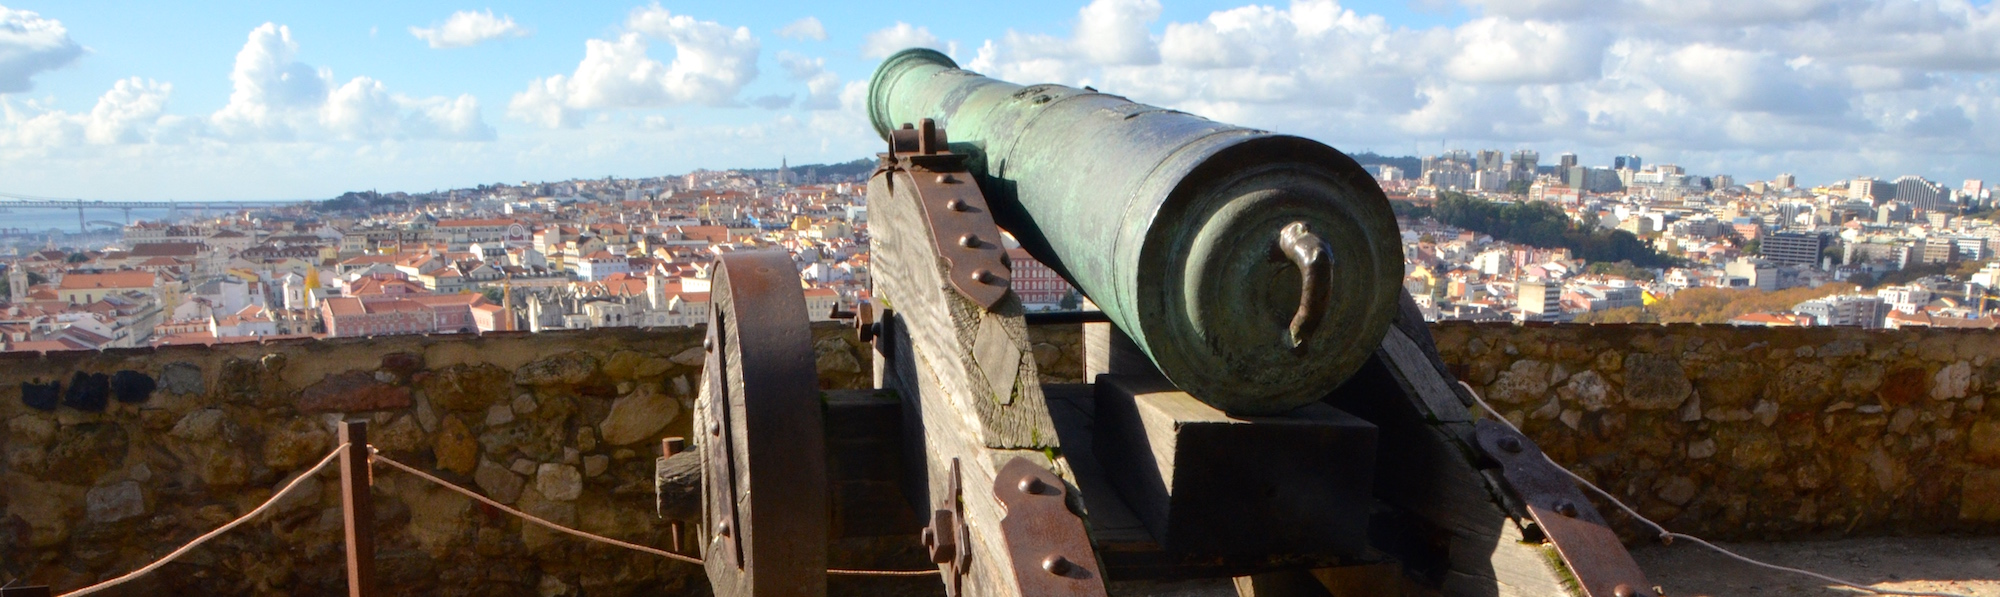 Castillo de San Jorge Abajo1, Lisboa